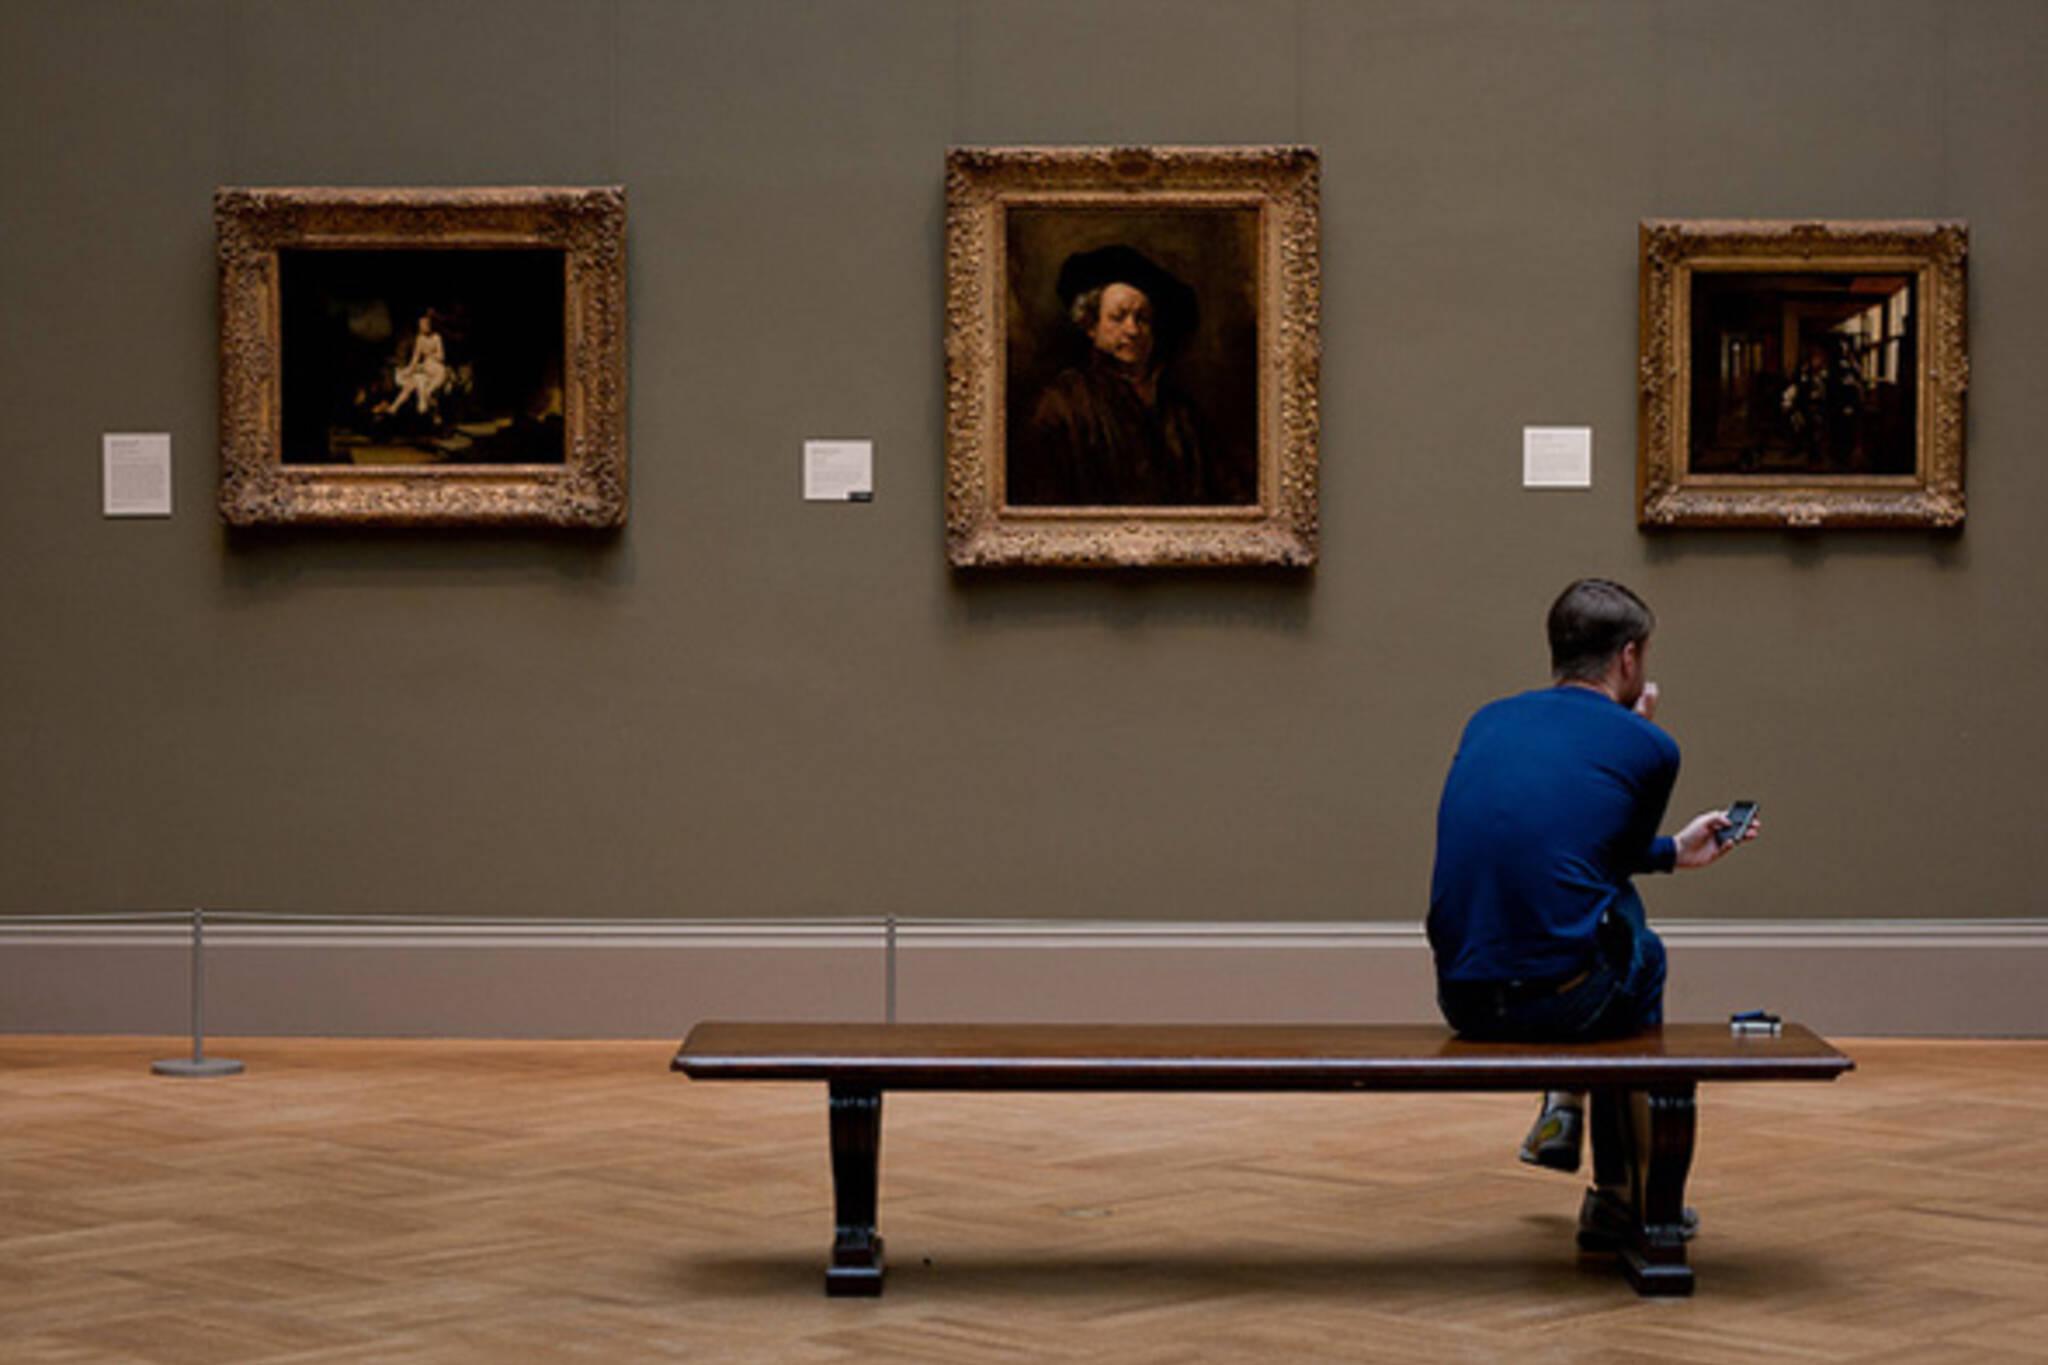 museum, art, sit